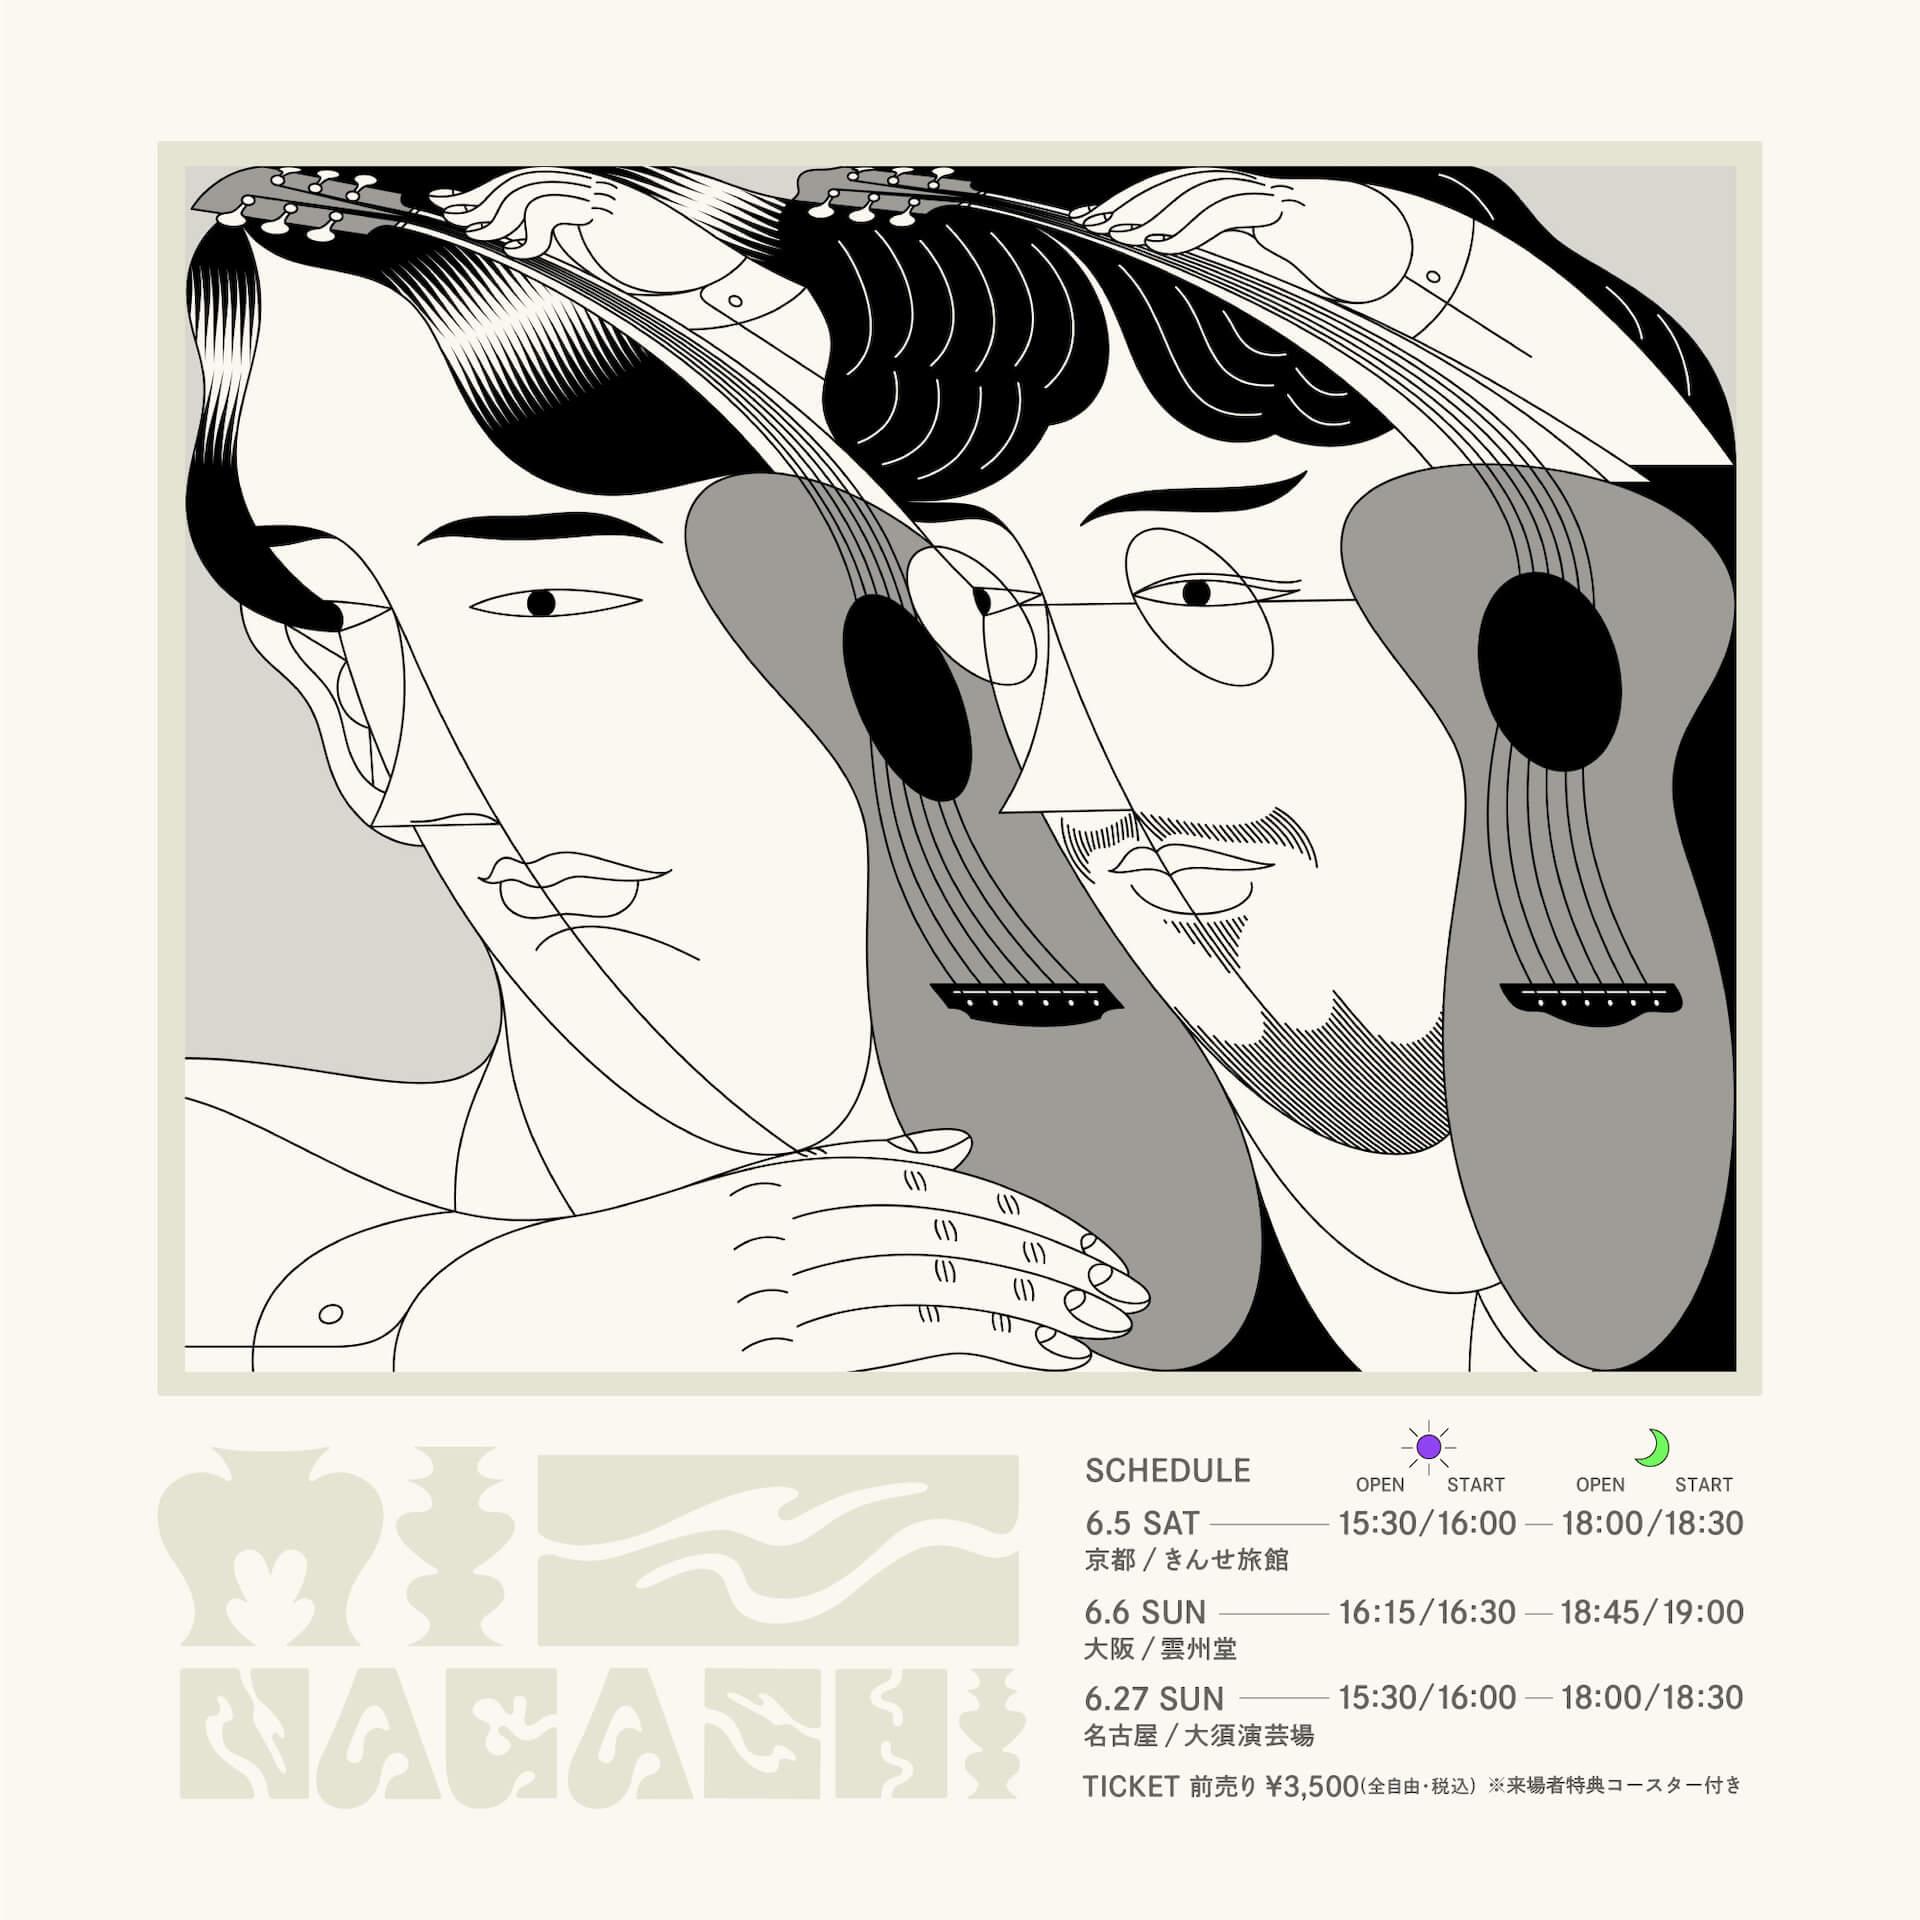 MONO NO AWARE玉置周啓と加藤成順によるユニットMIZが京名阪ワンマンツアーを開催決定! music210419_miz-210419_1